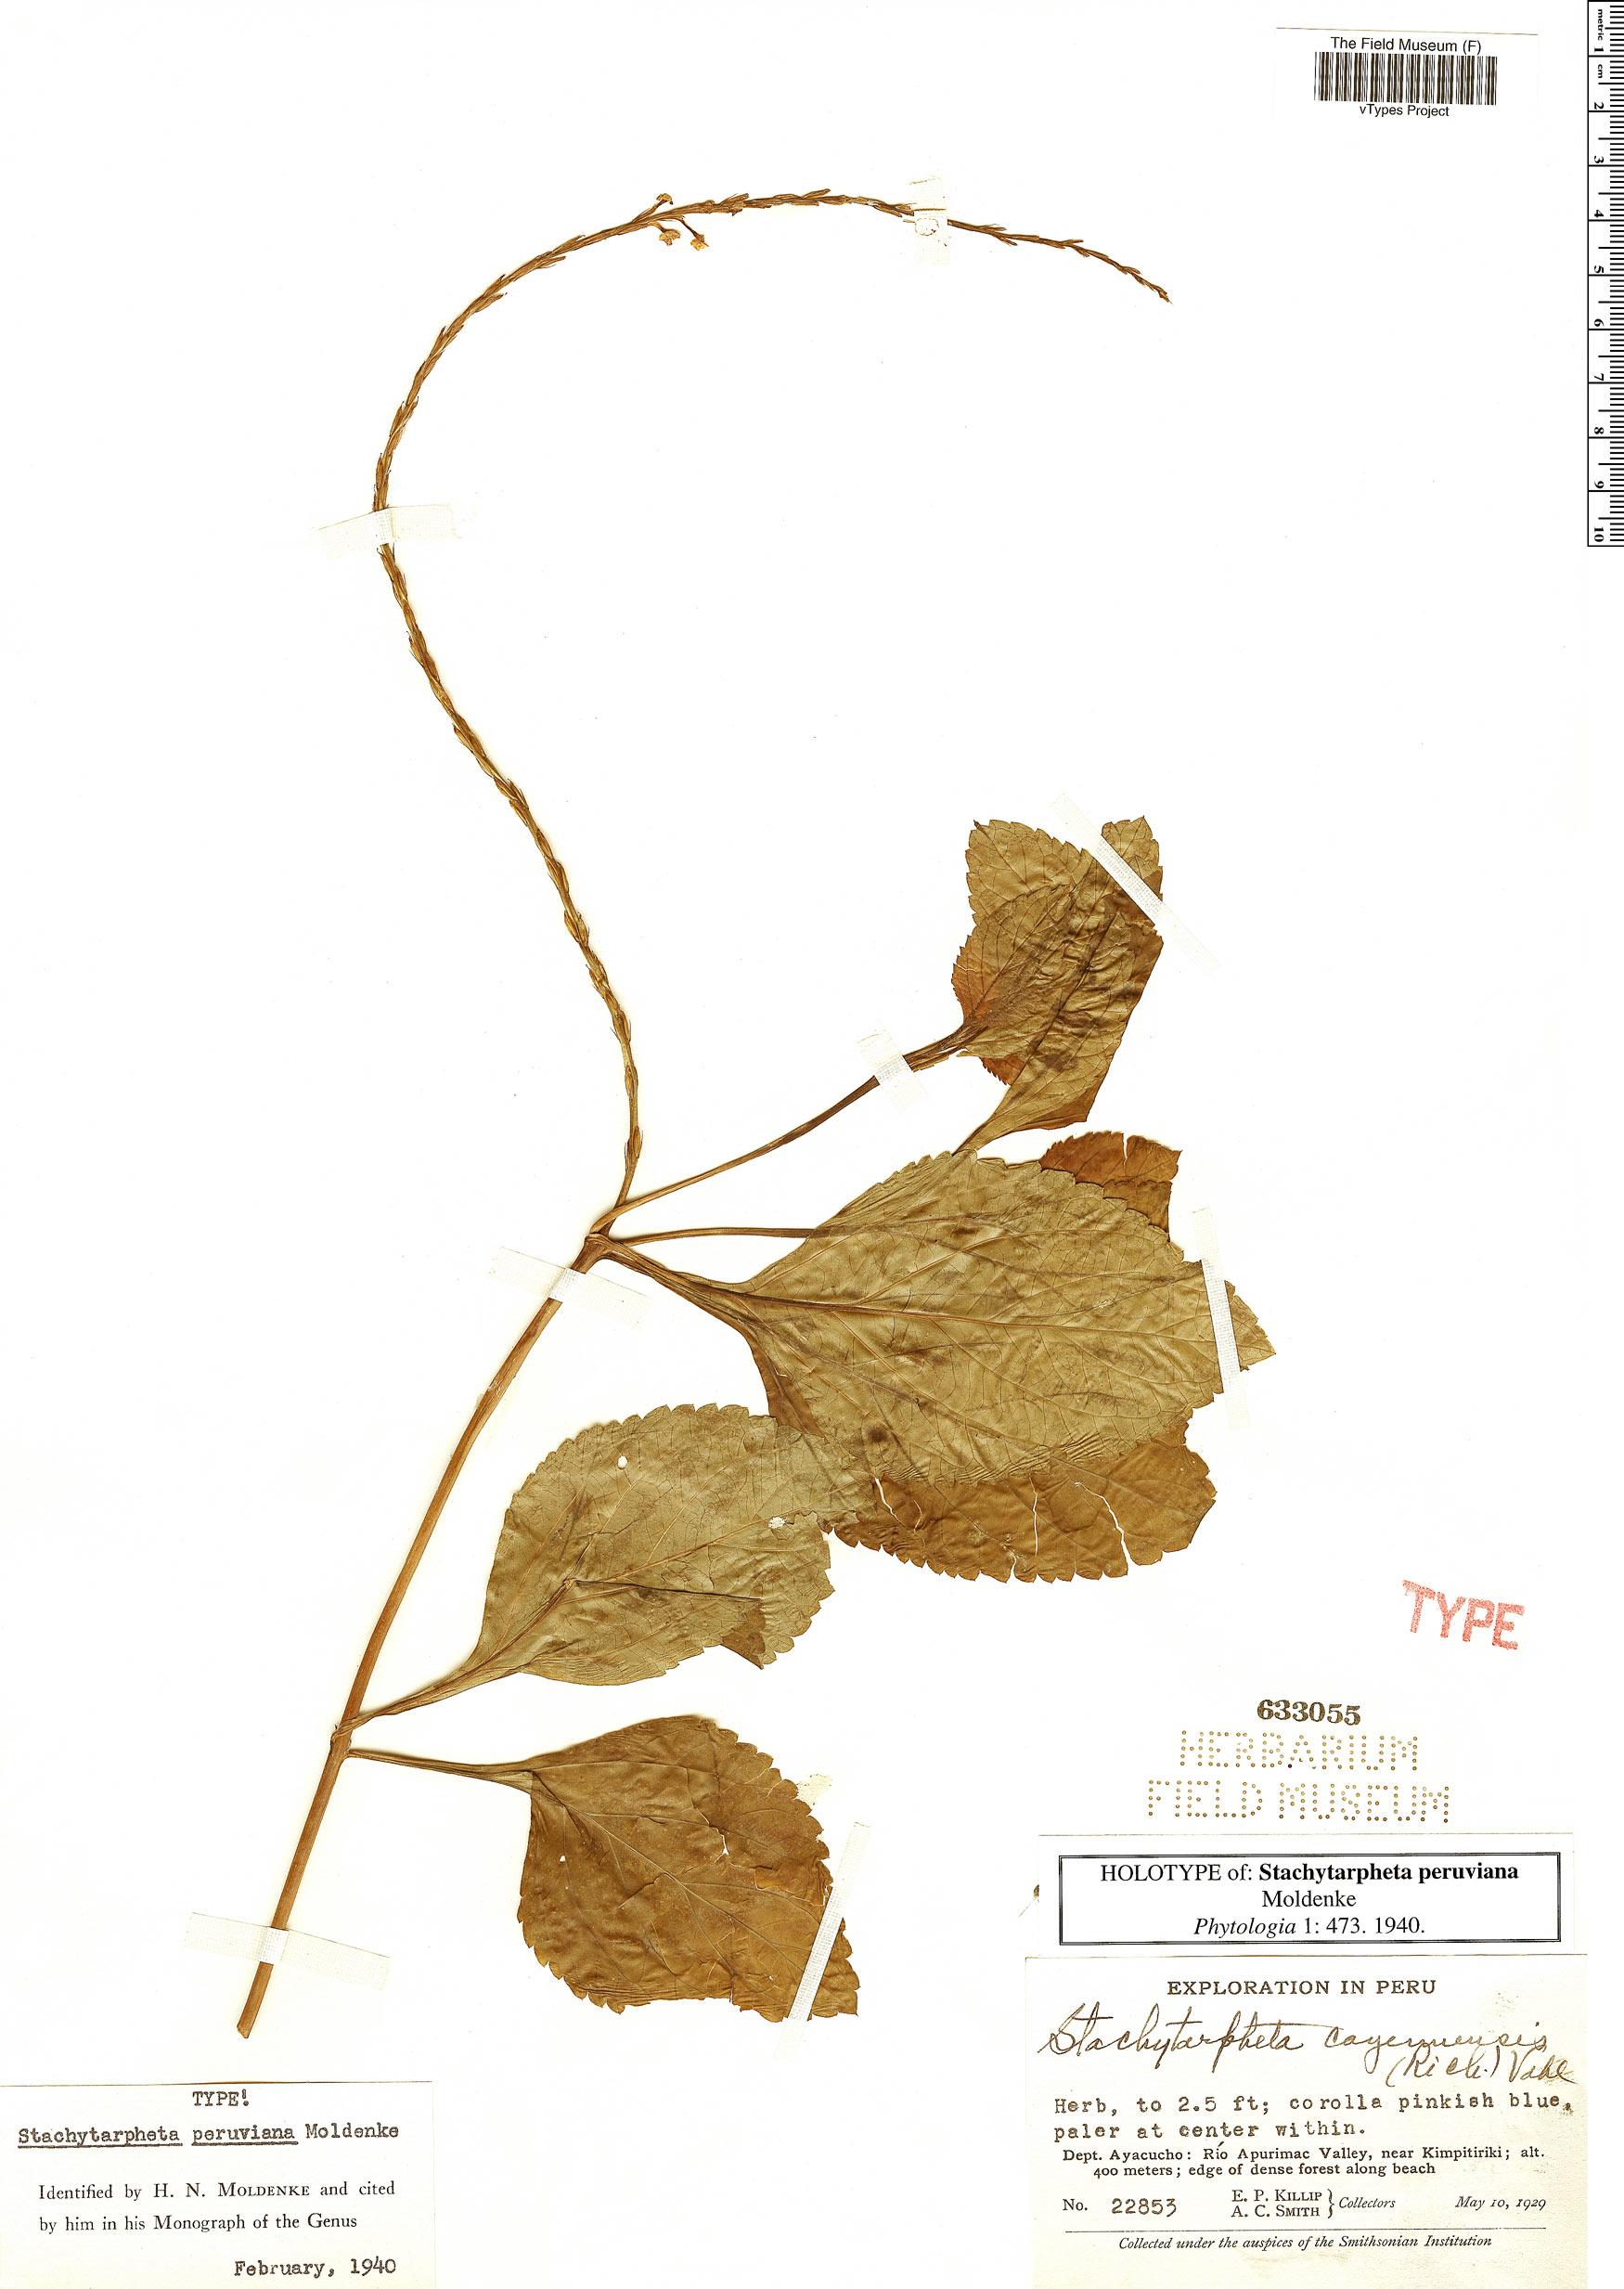 Specimen: Stachytarpheta peruviana